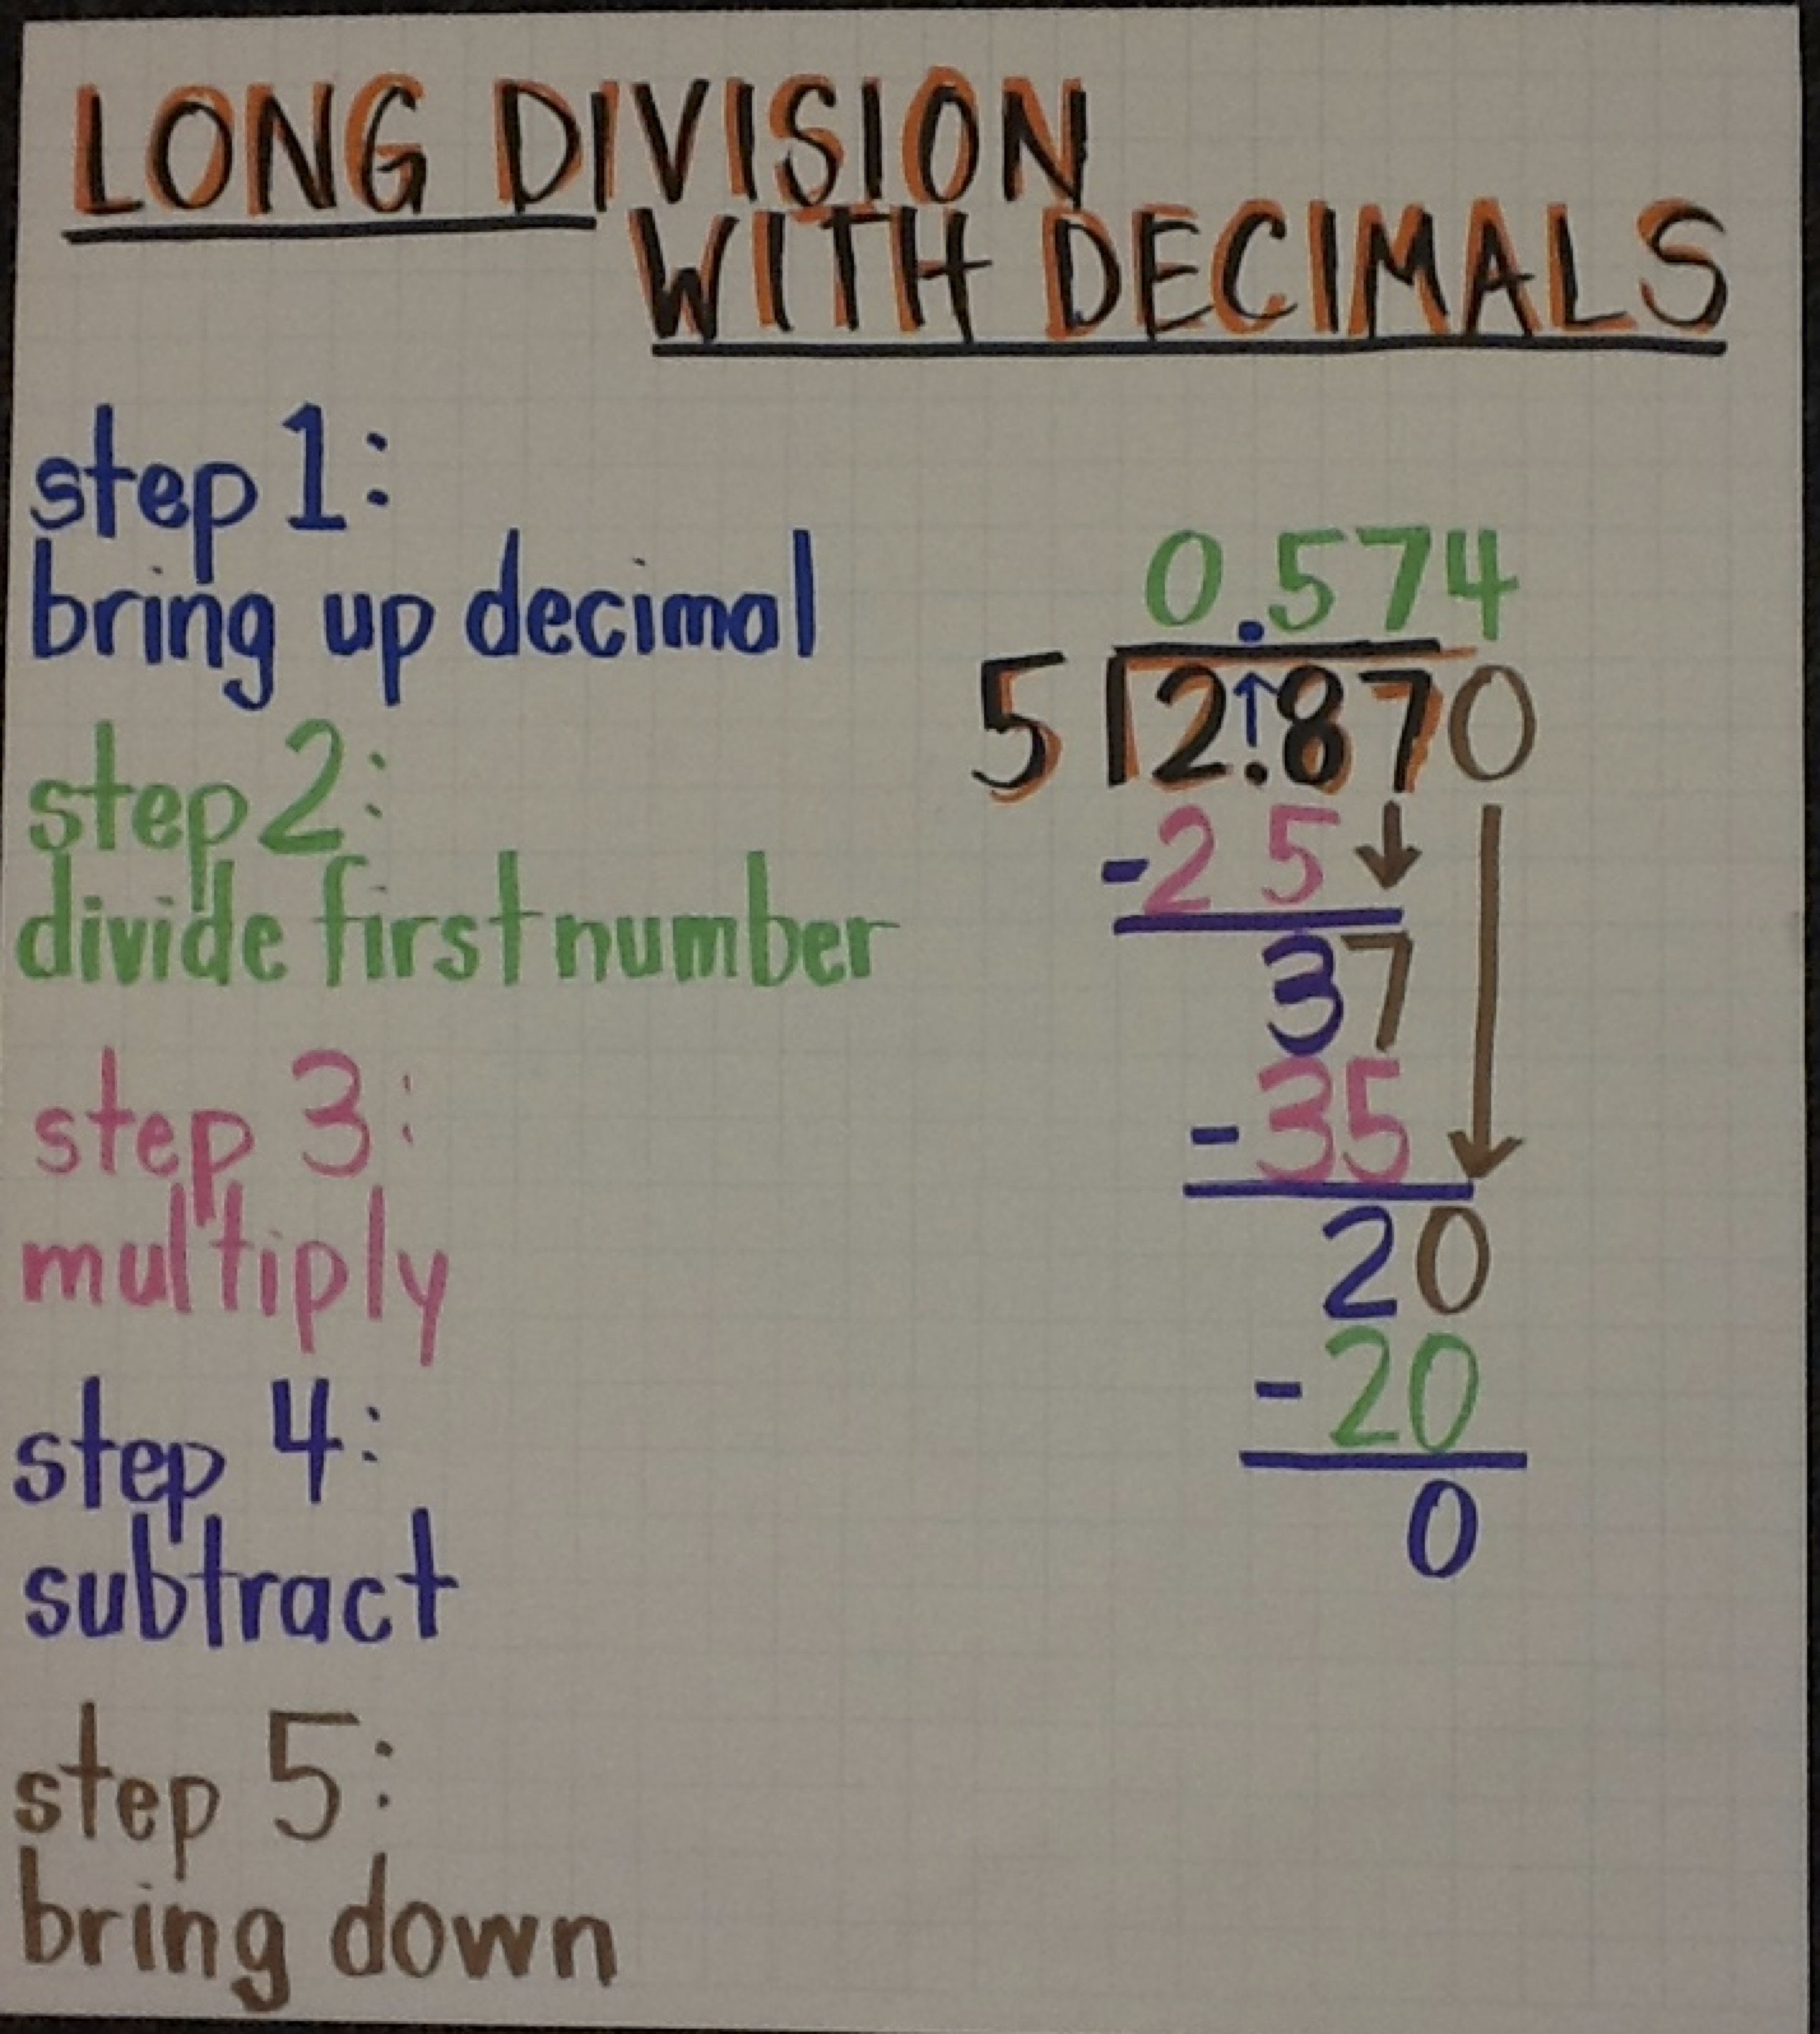 Long Division With Decimals Mathtutoring